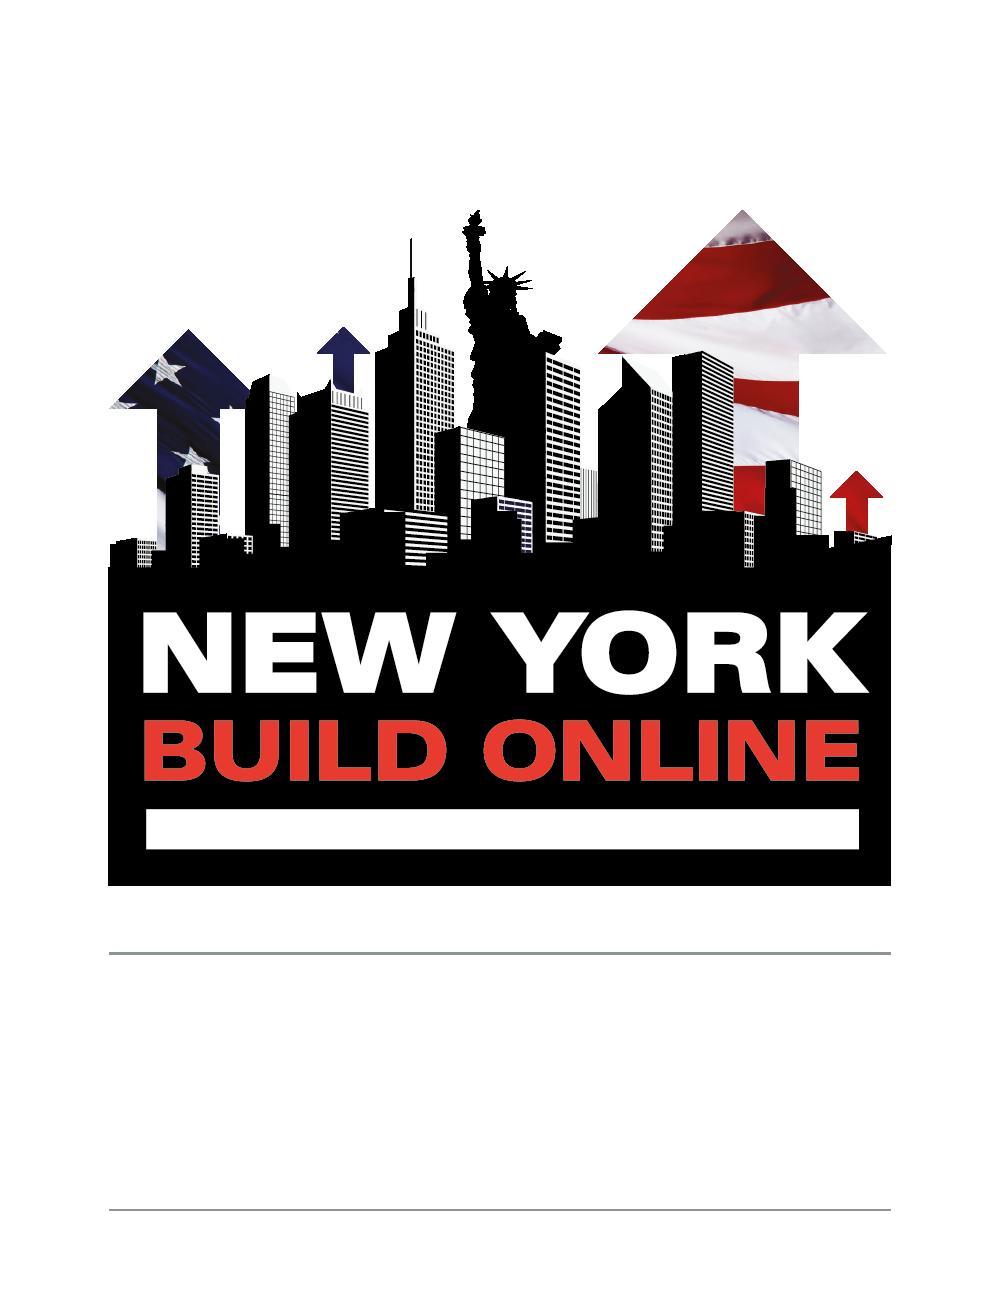 New York Build Online